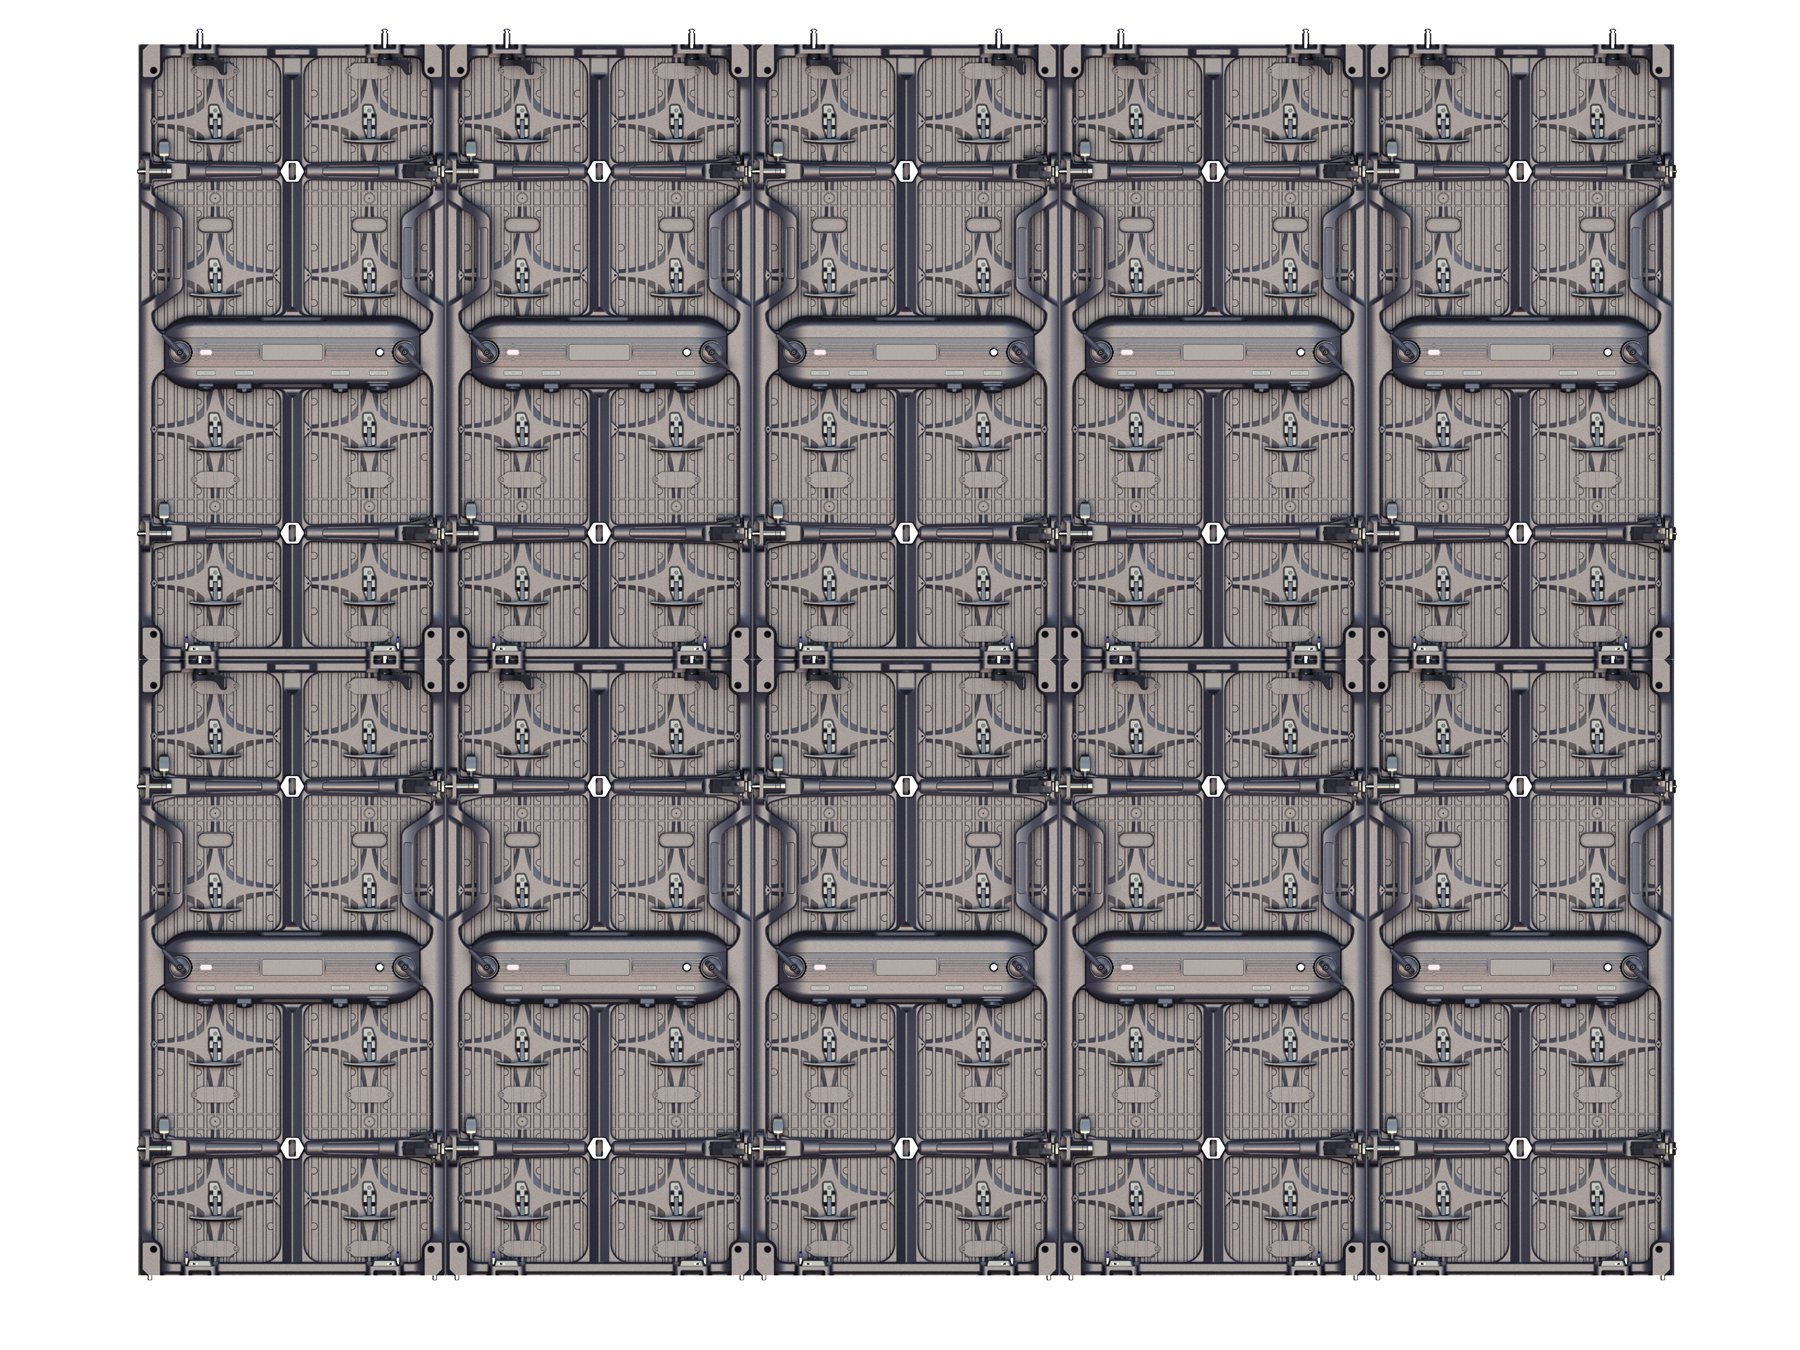 ULS rental LED virtual production 500x1000 rendering 5